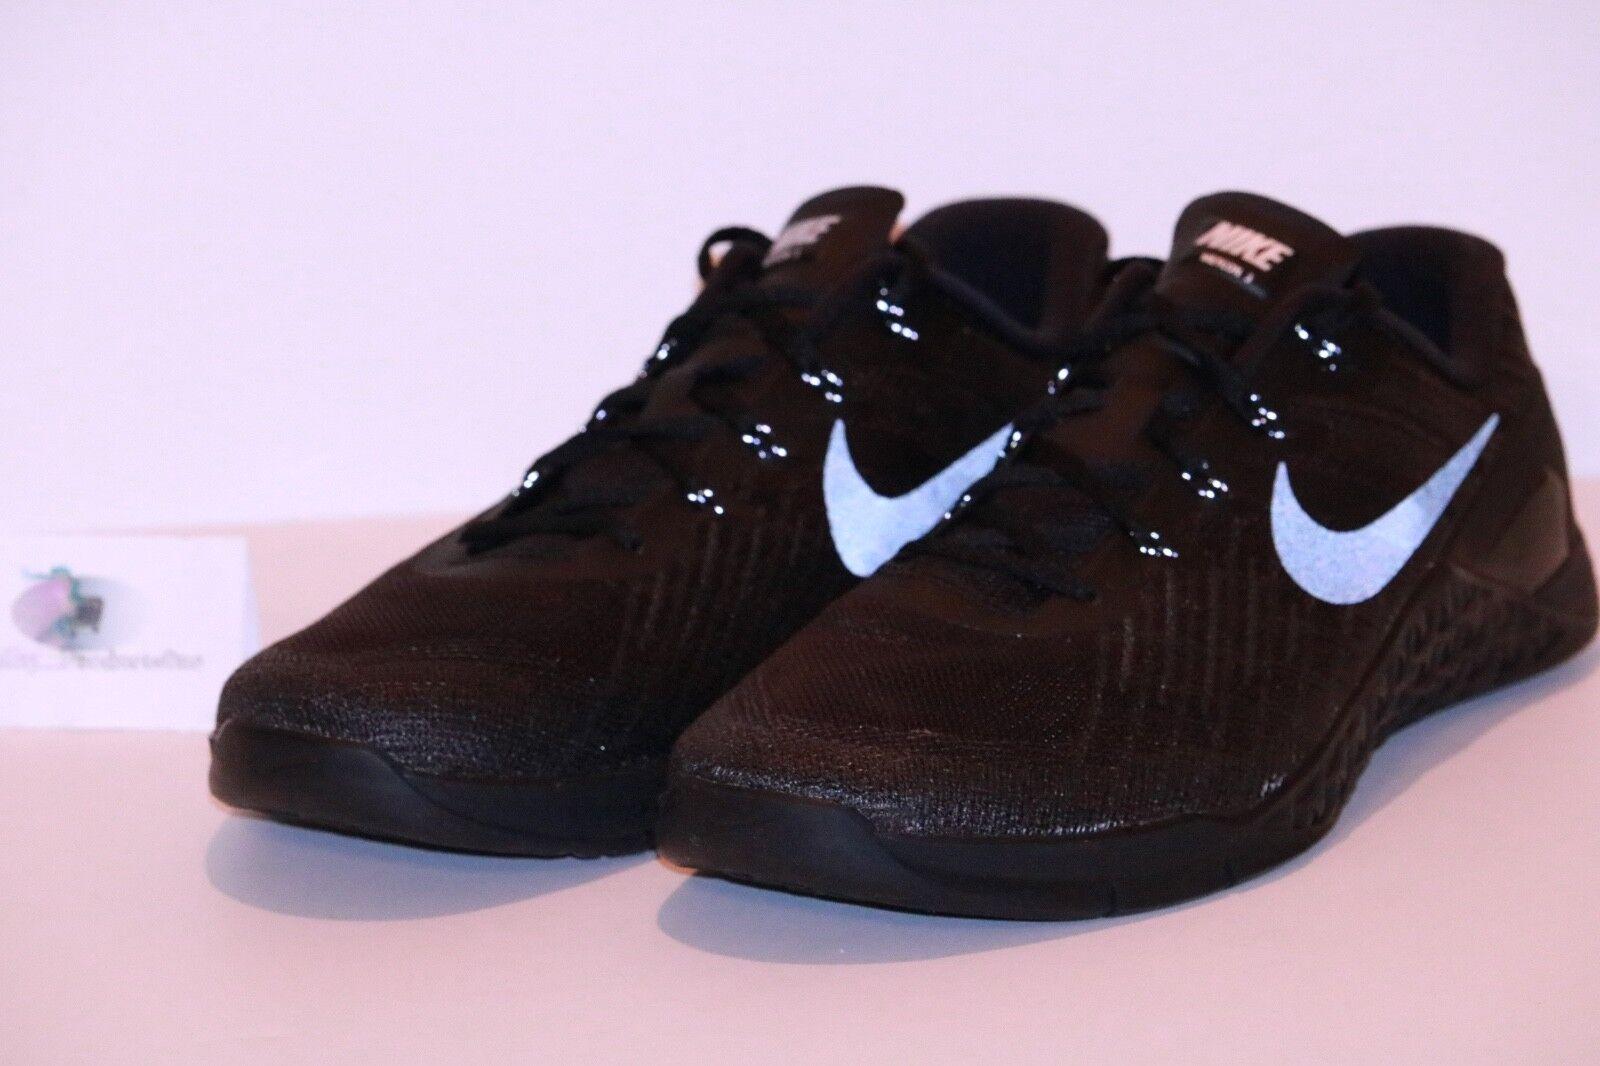 Hombre / Nike metcon 3 Negro / Hombre Negro Cross Fit zapatos 852928 00SZ 11 ec7baf